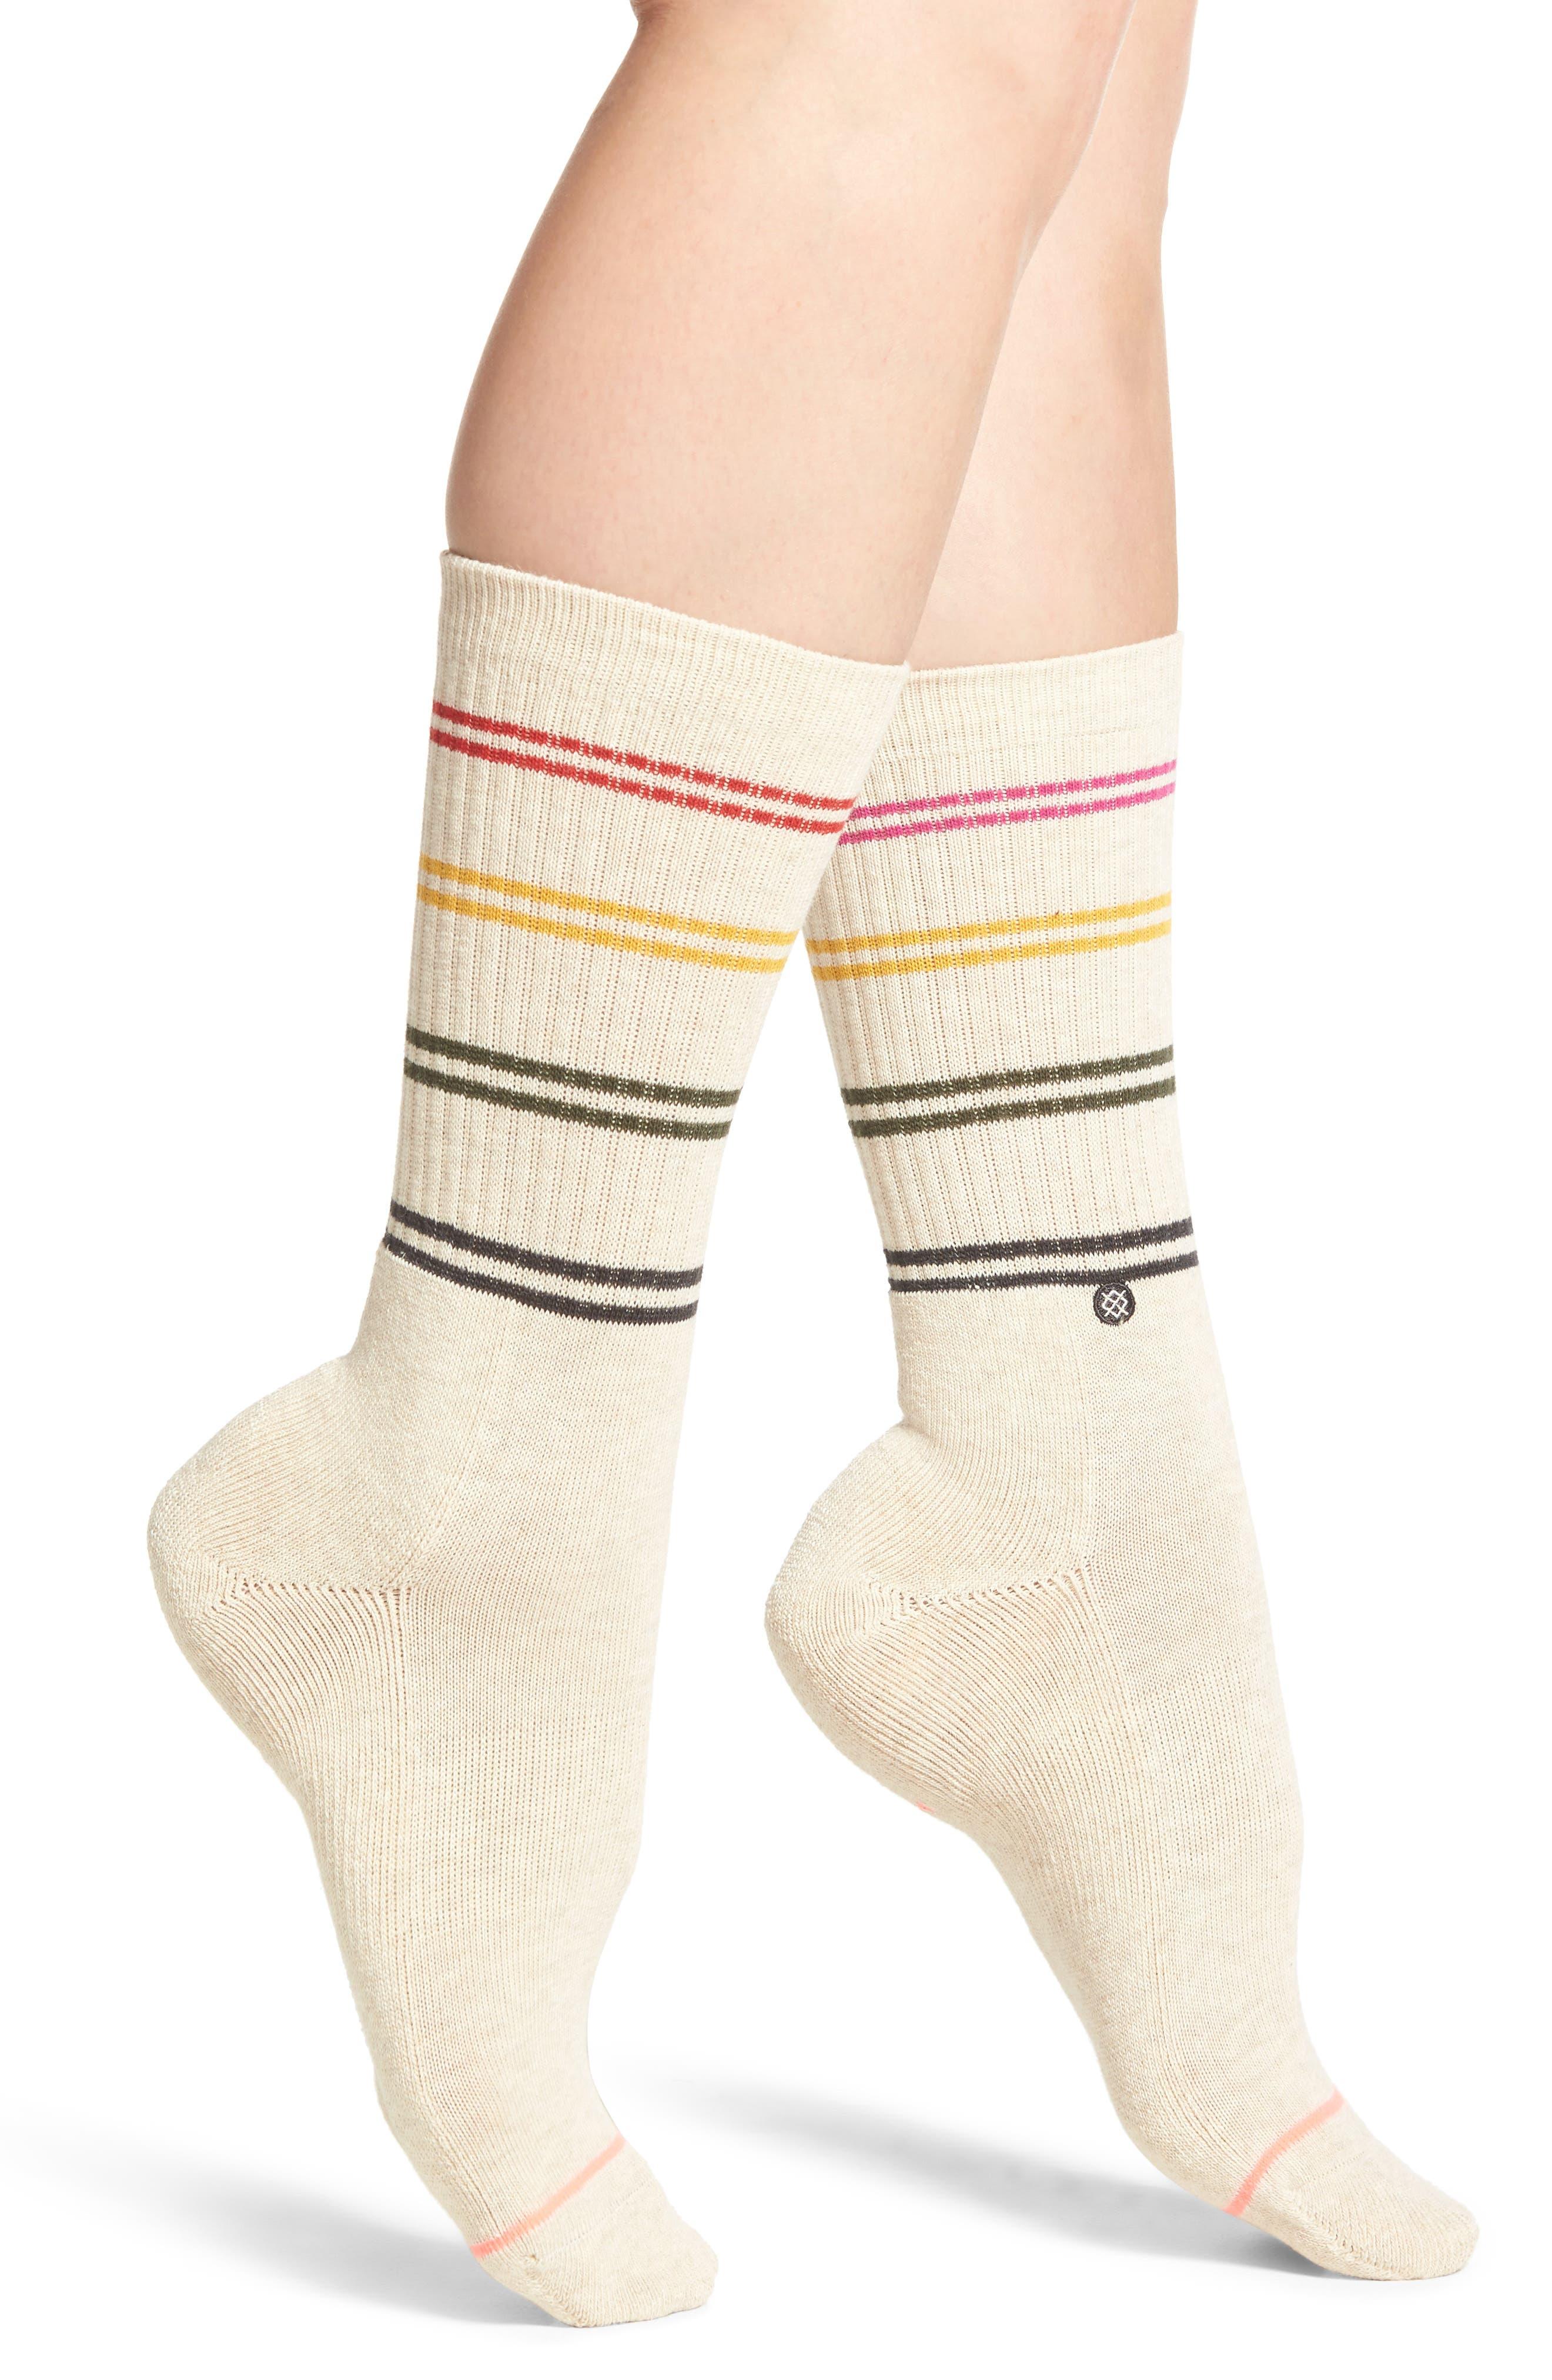 Jah Crew Socks,                             Main thumbnail 1, color,                             Oatmeal Heather